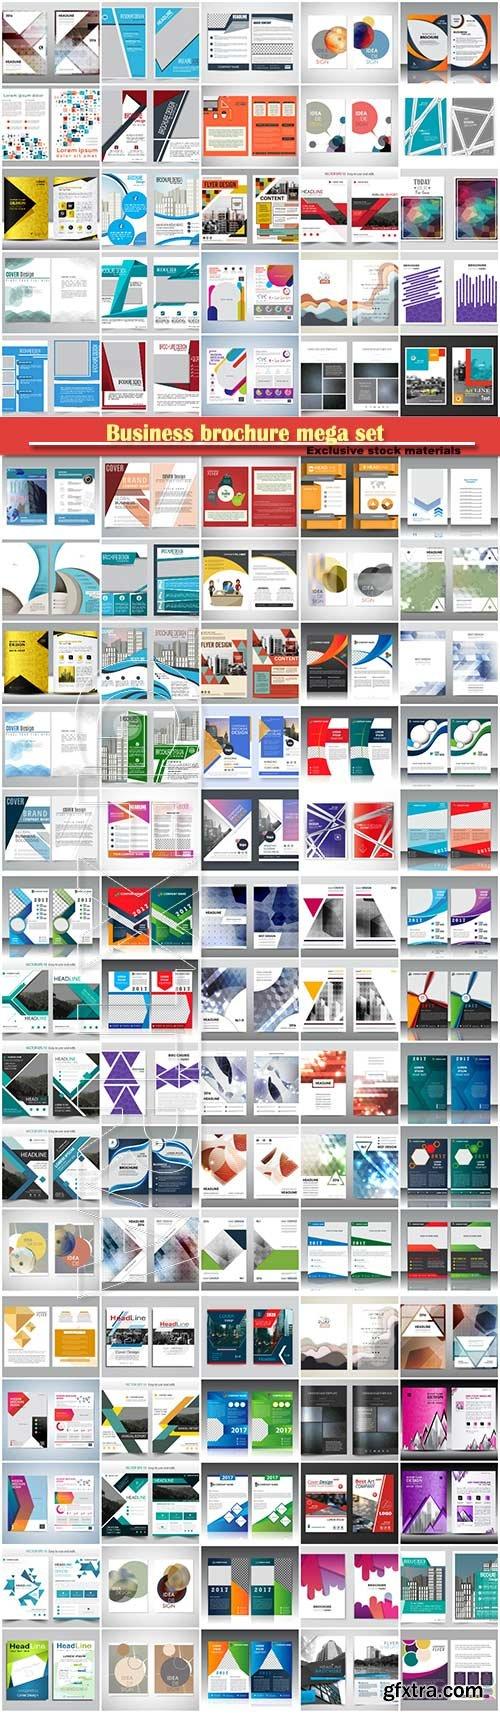 Business brochure mega set, vector flyers template # 3